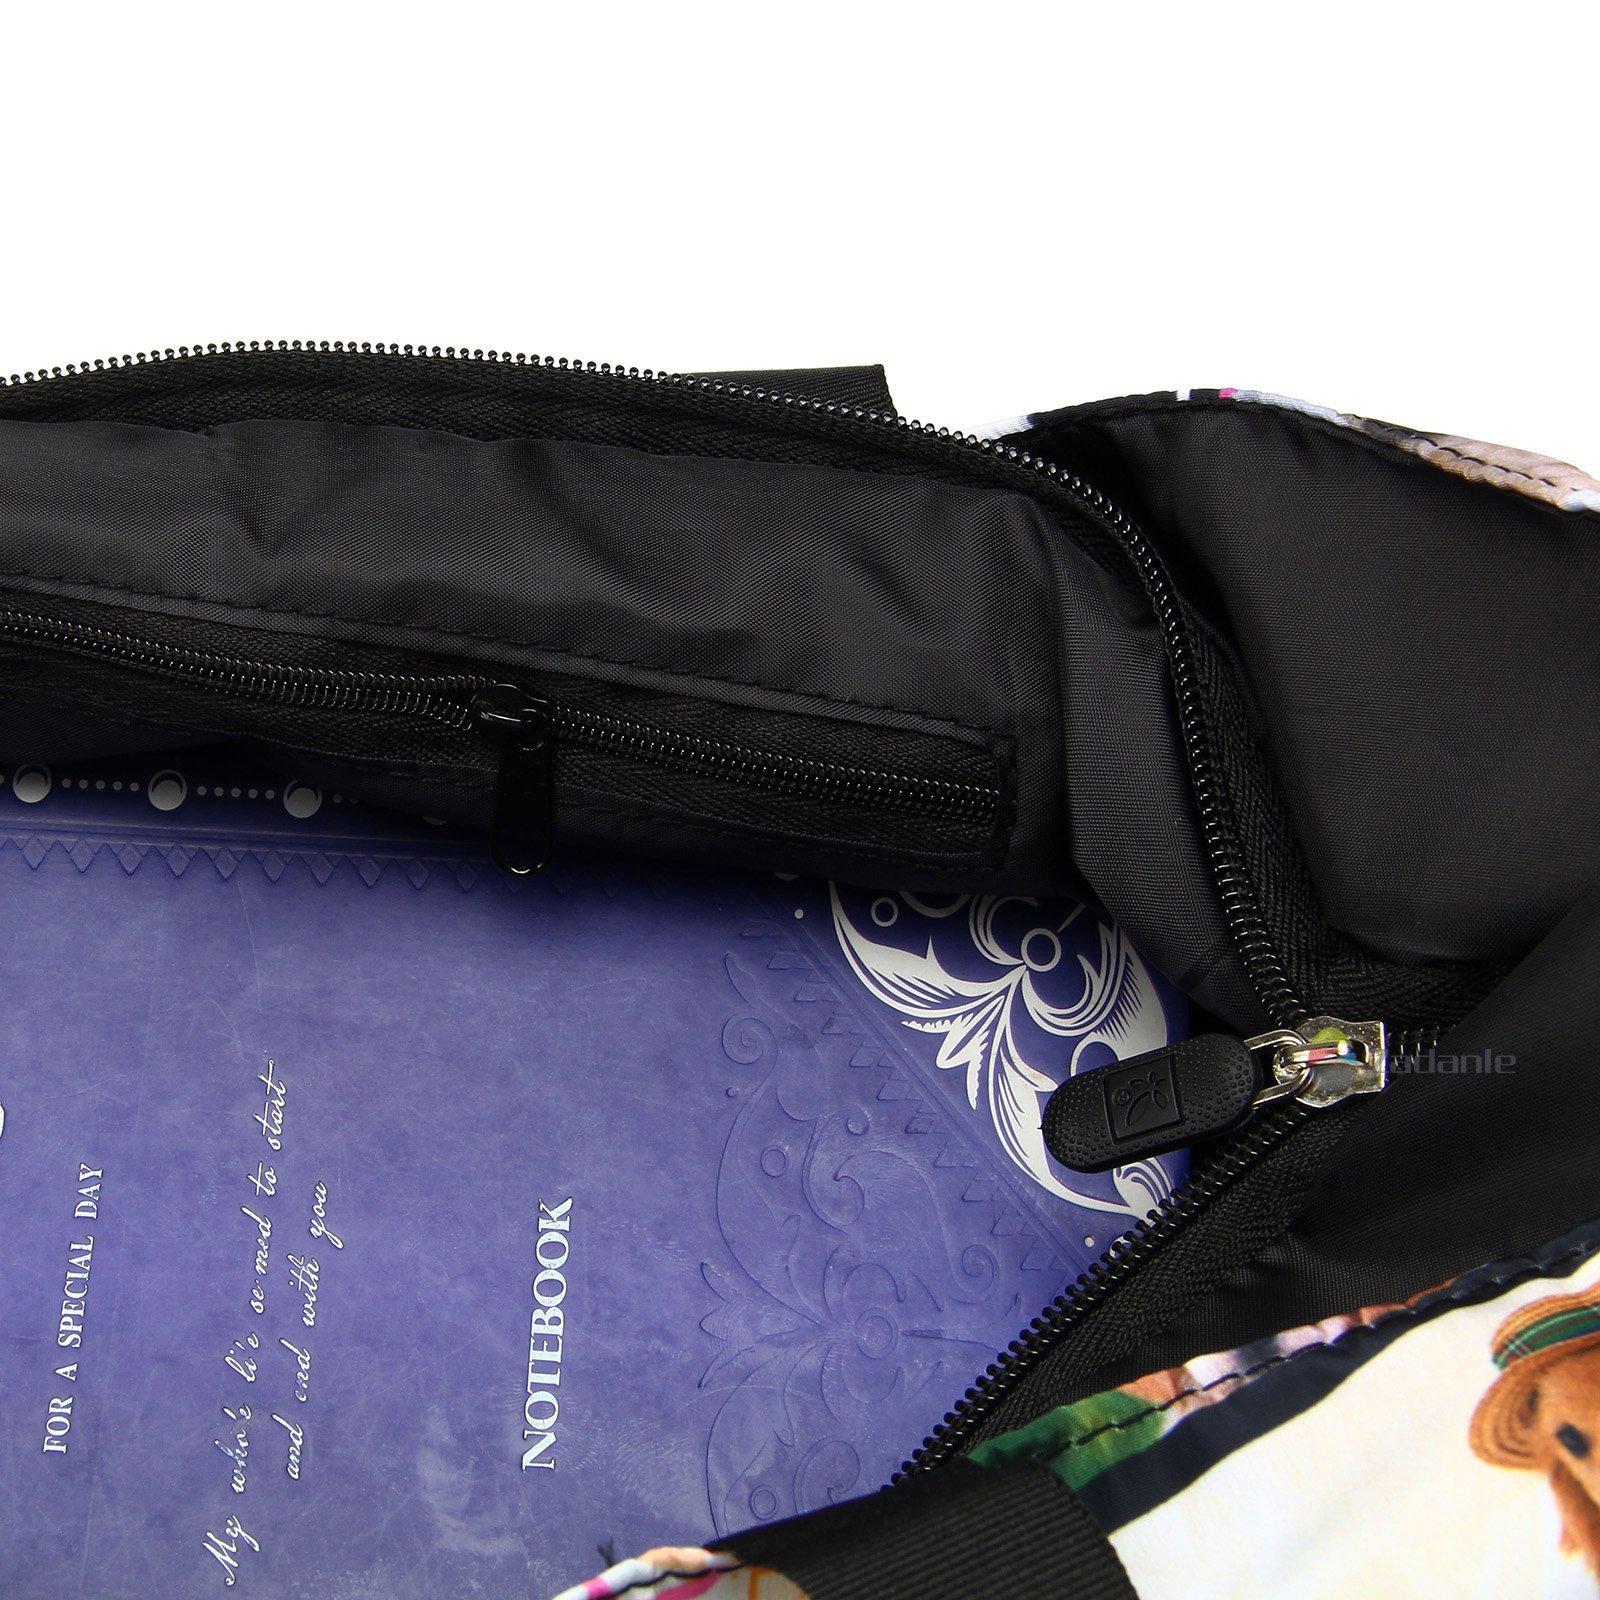 Newplenty Ladies Zippered Light Shoulder Shopping Tote Bag Handbag Beach Satchel, Many Dogs by newplenty (Image #6)